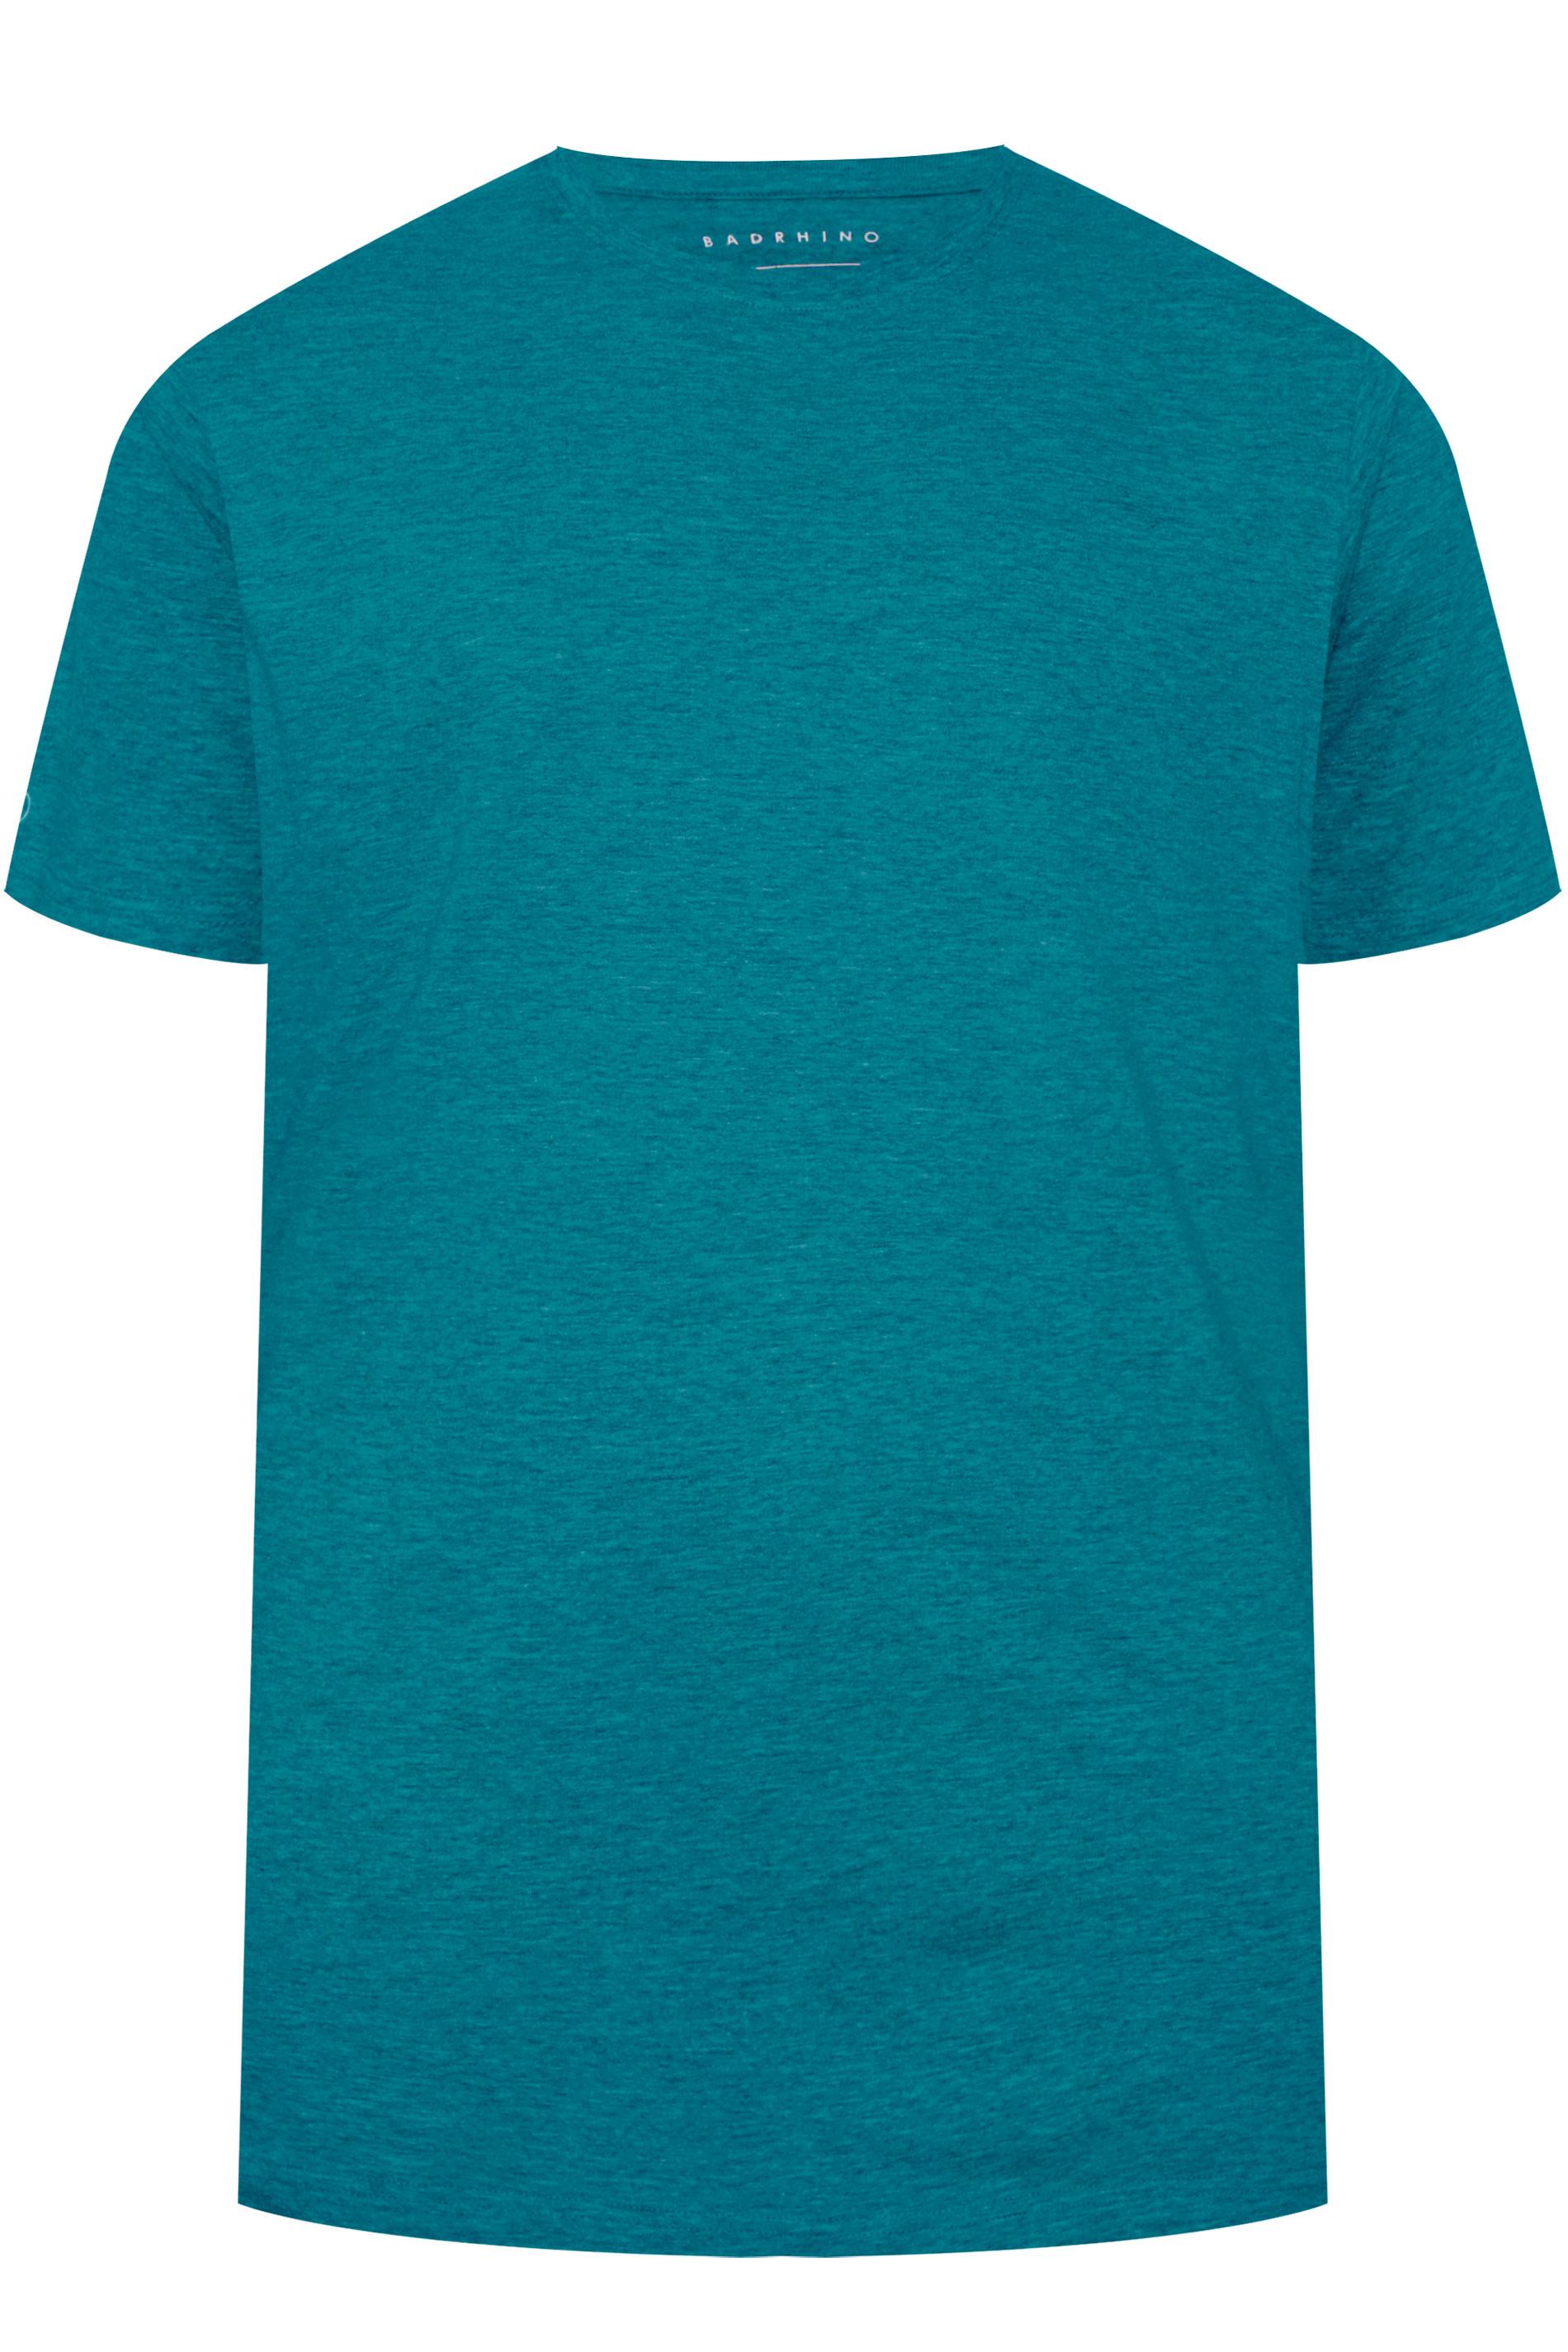 BadRhino Ocean Blue Marl Embroidered Logo T-Shirt